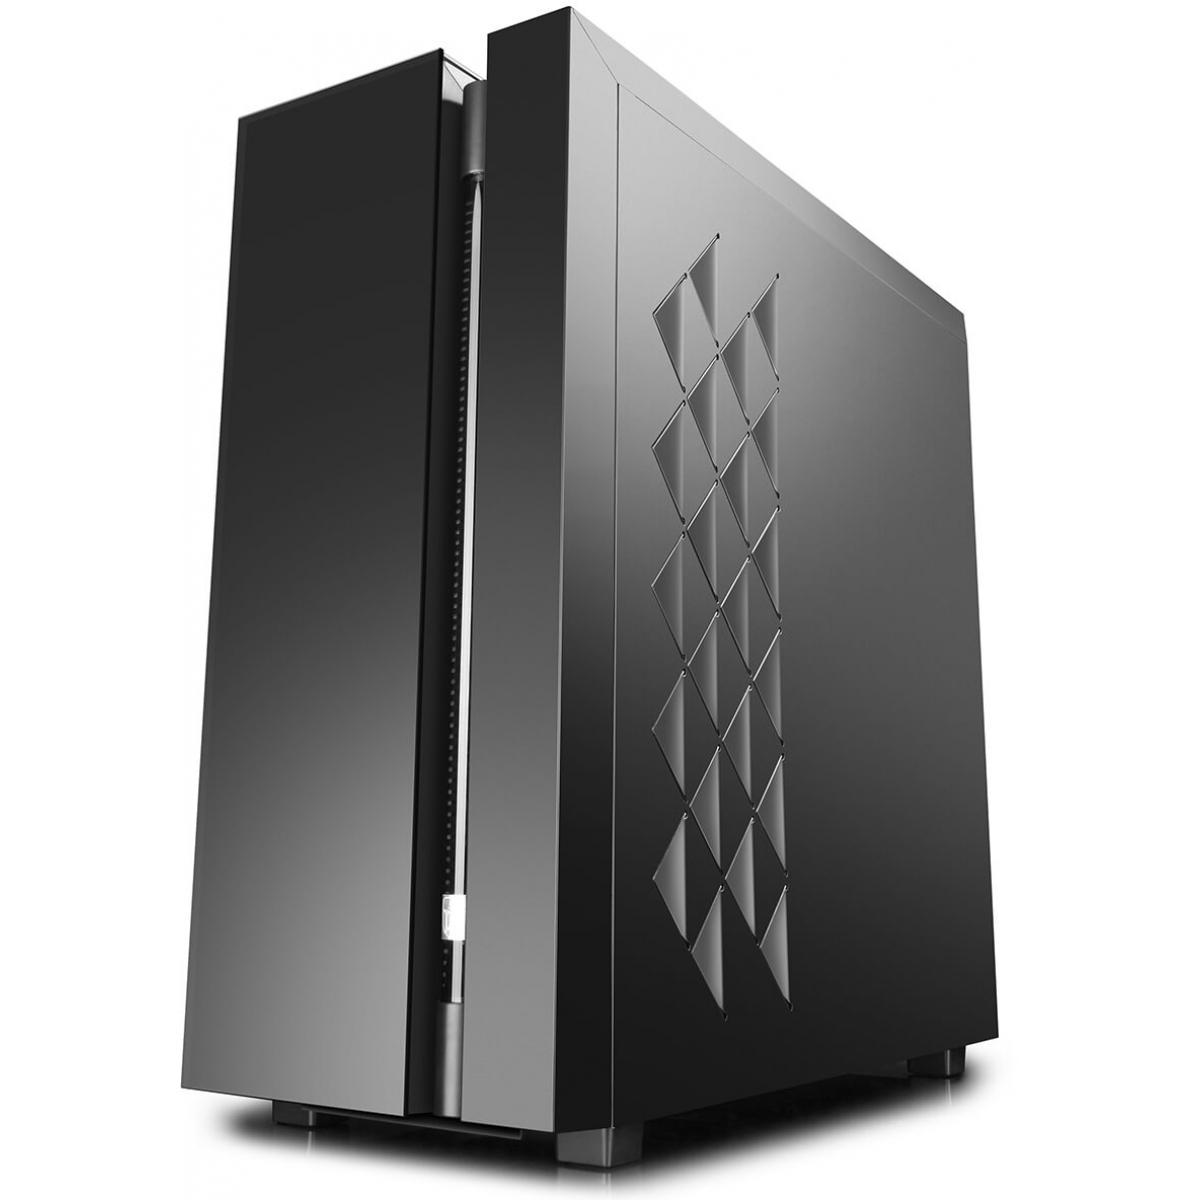 Gabinete Gamer DeepCool New Ark 90, Full Tower, Com Water Captain 280mm RGB, Vidro Temperado, Black, S-Fonte, DP-ATXLCS-NARK90BK